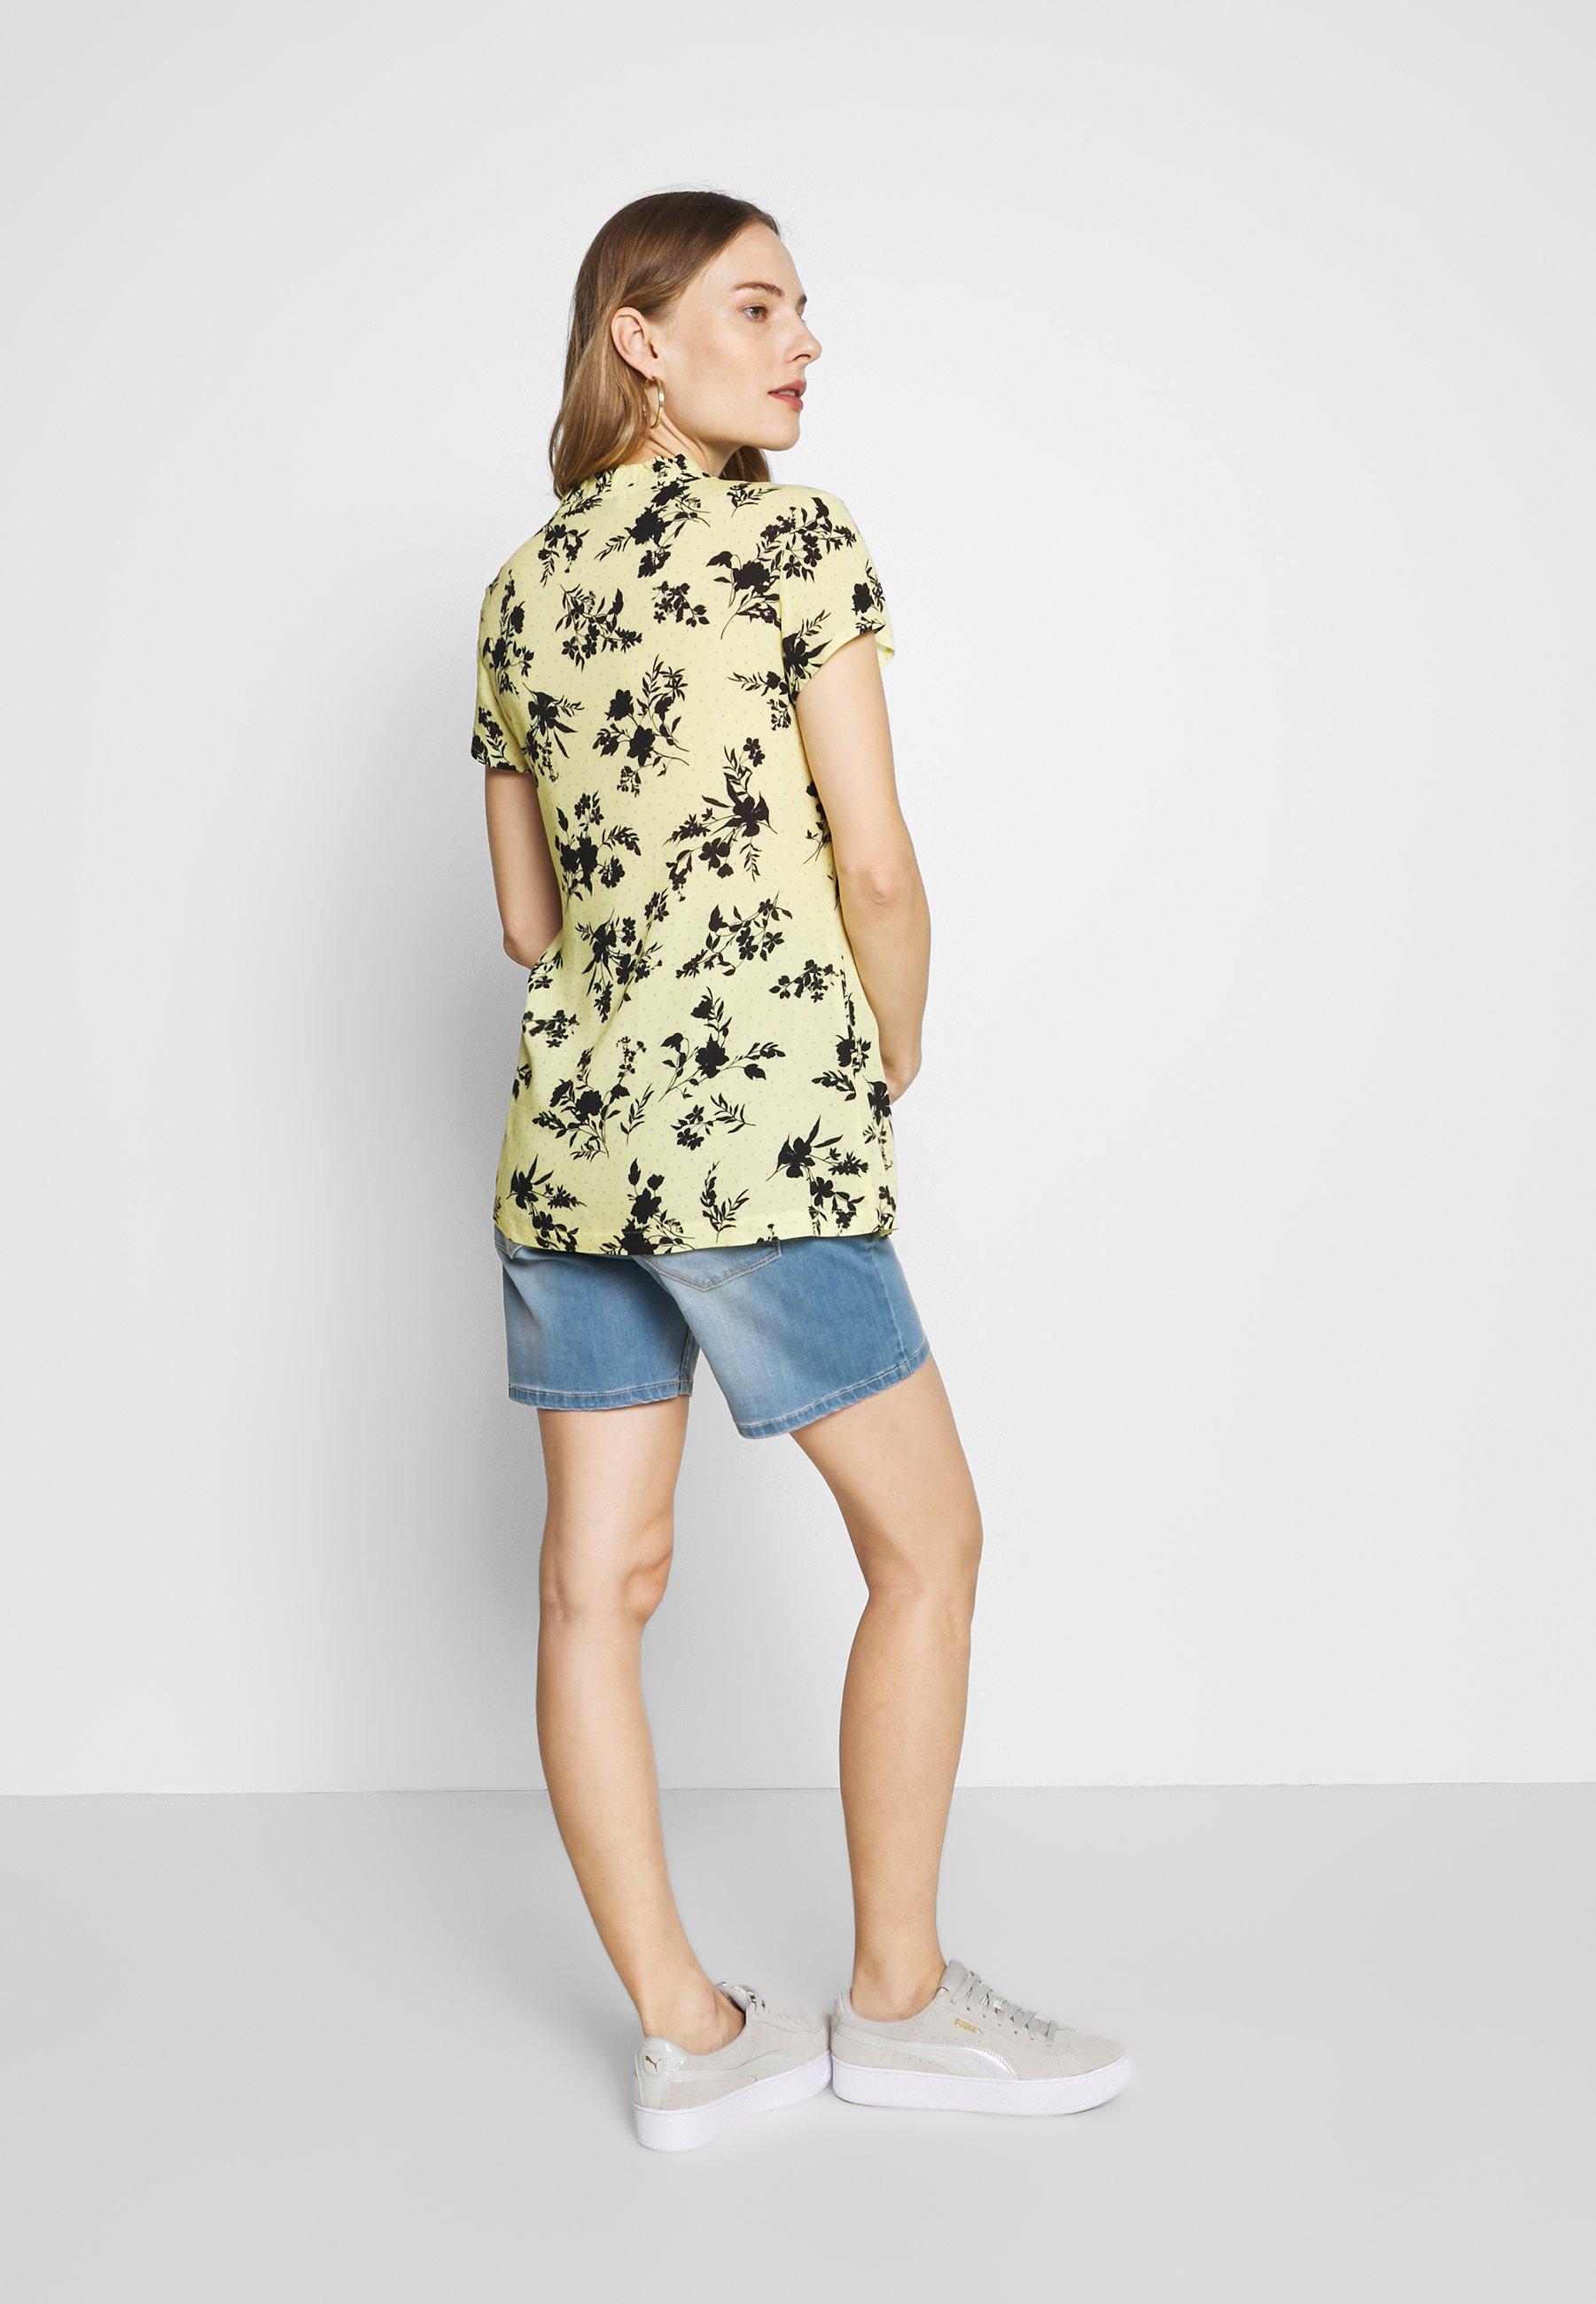 Supermom Short - Jeans / Cowboy Shorts Light Blue Denim